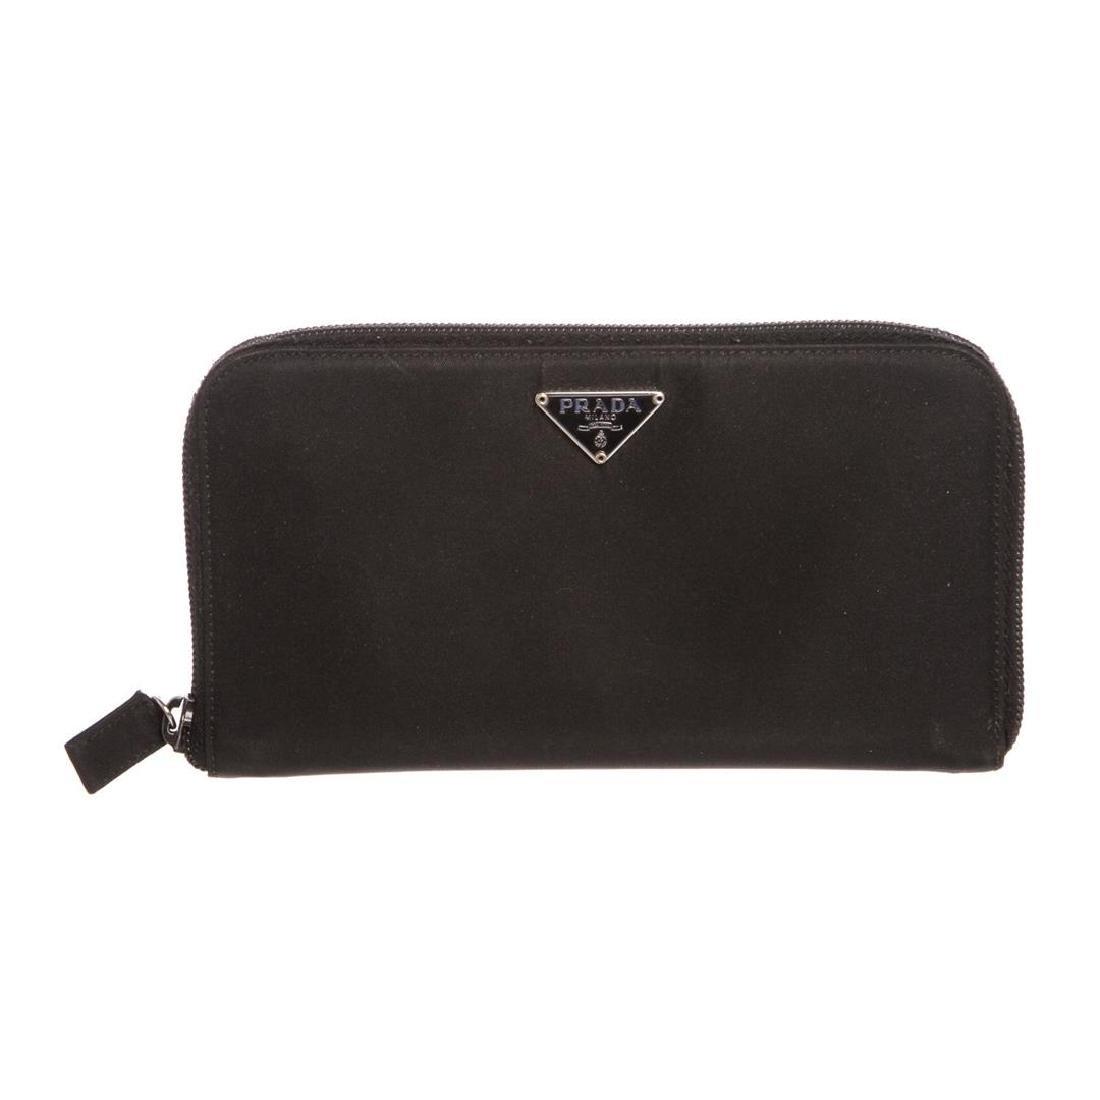 Prada Black Nylon Leather Zipper Wallet